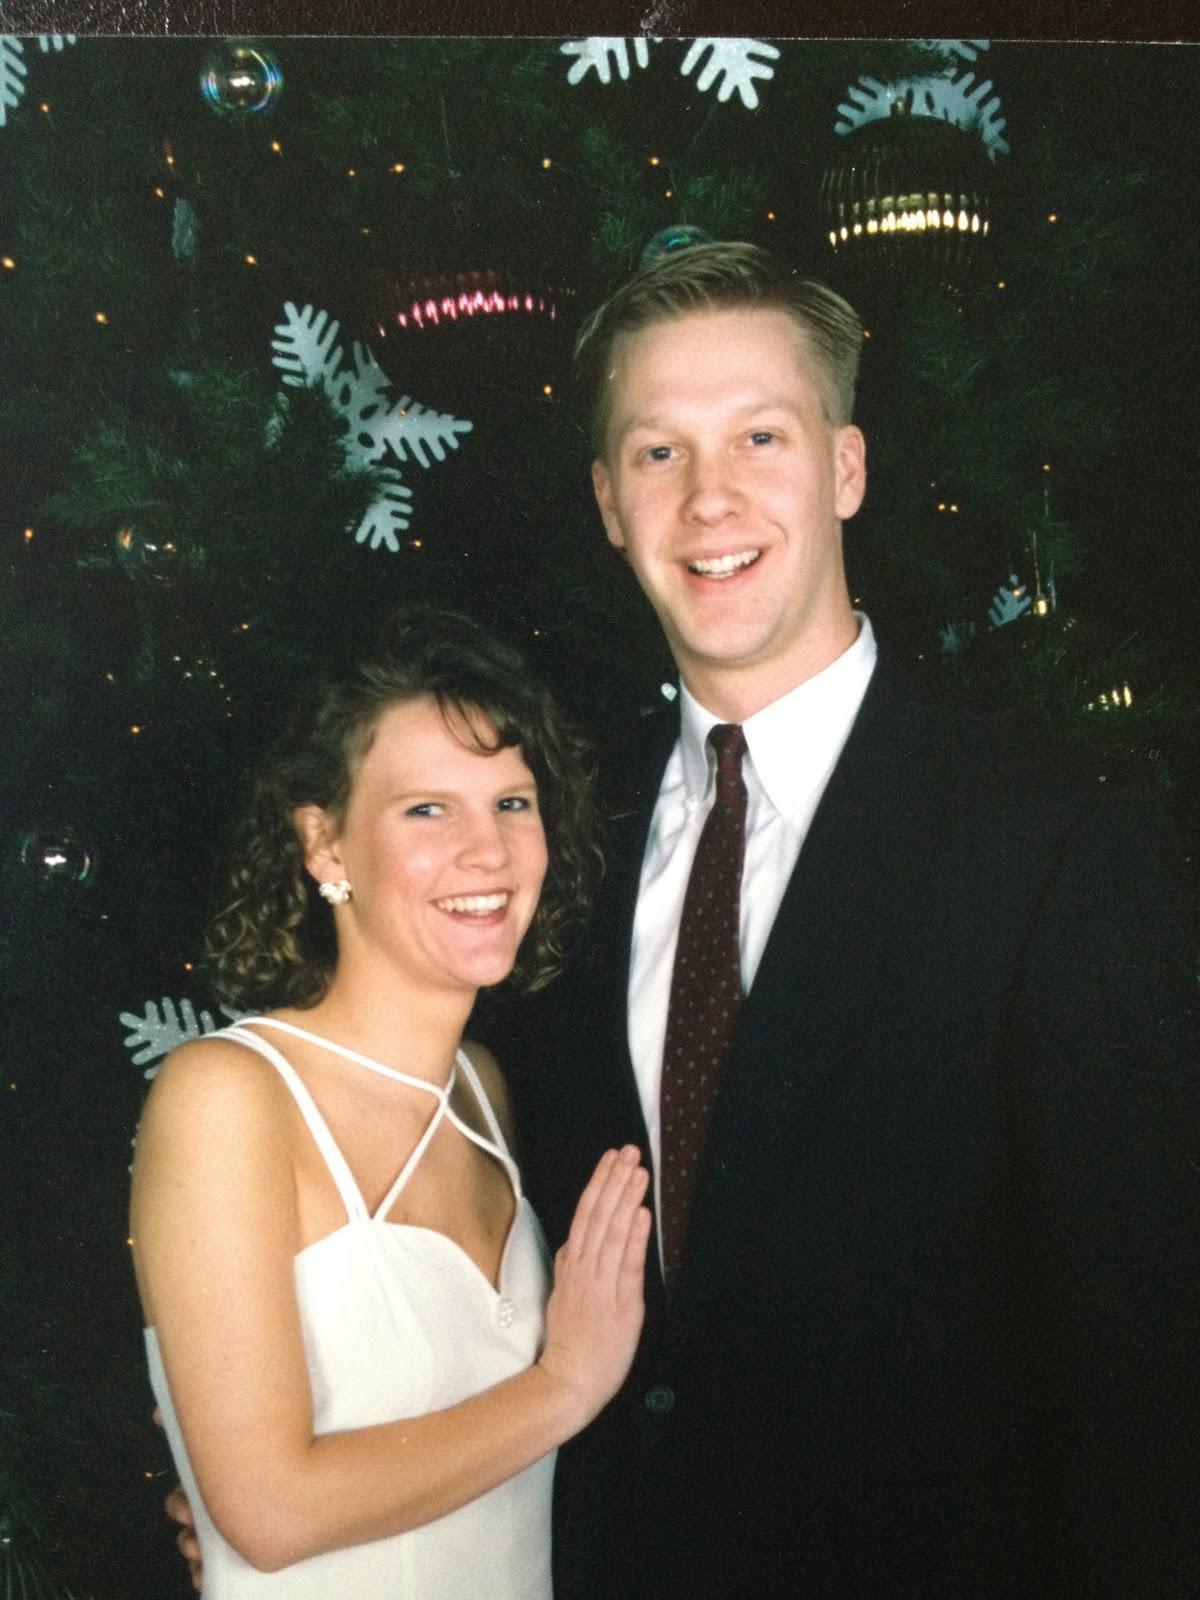 Atheist girl dating christian boy